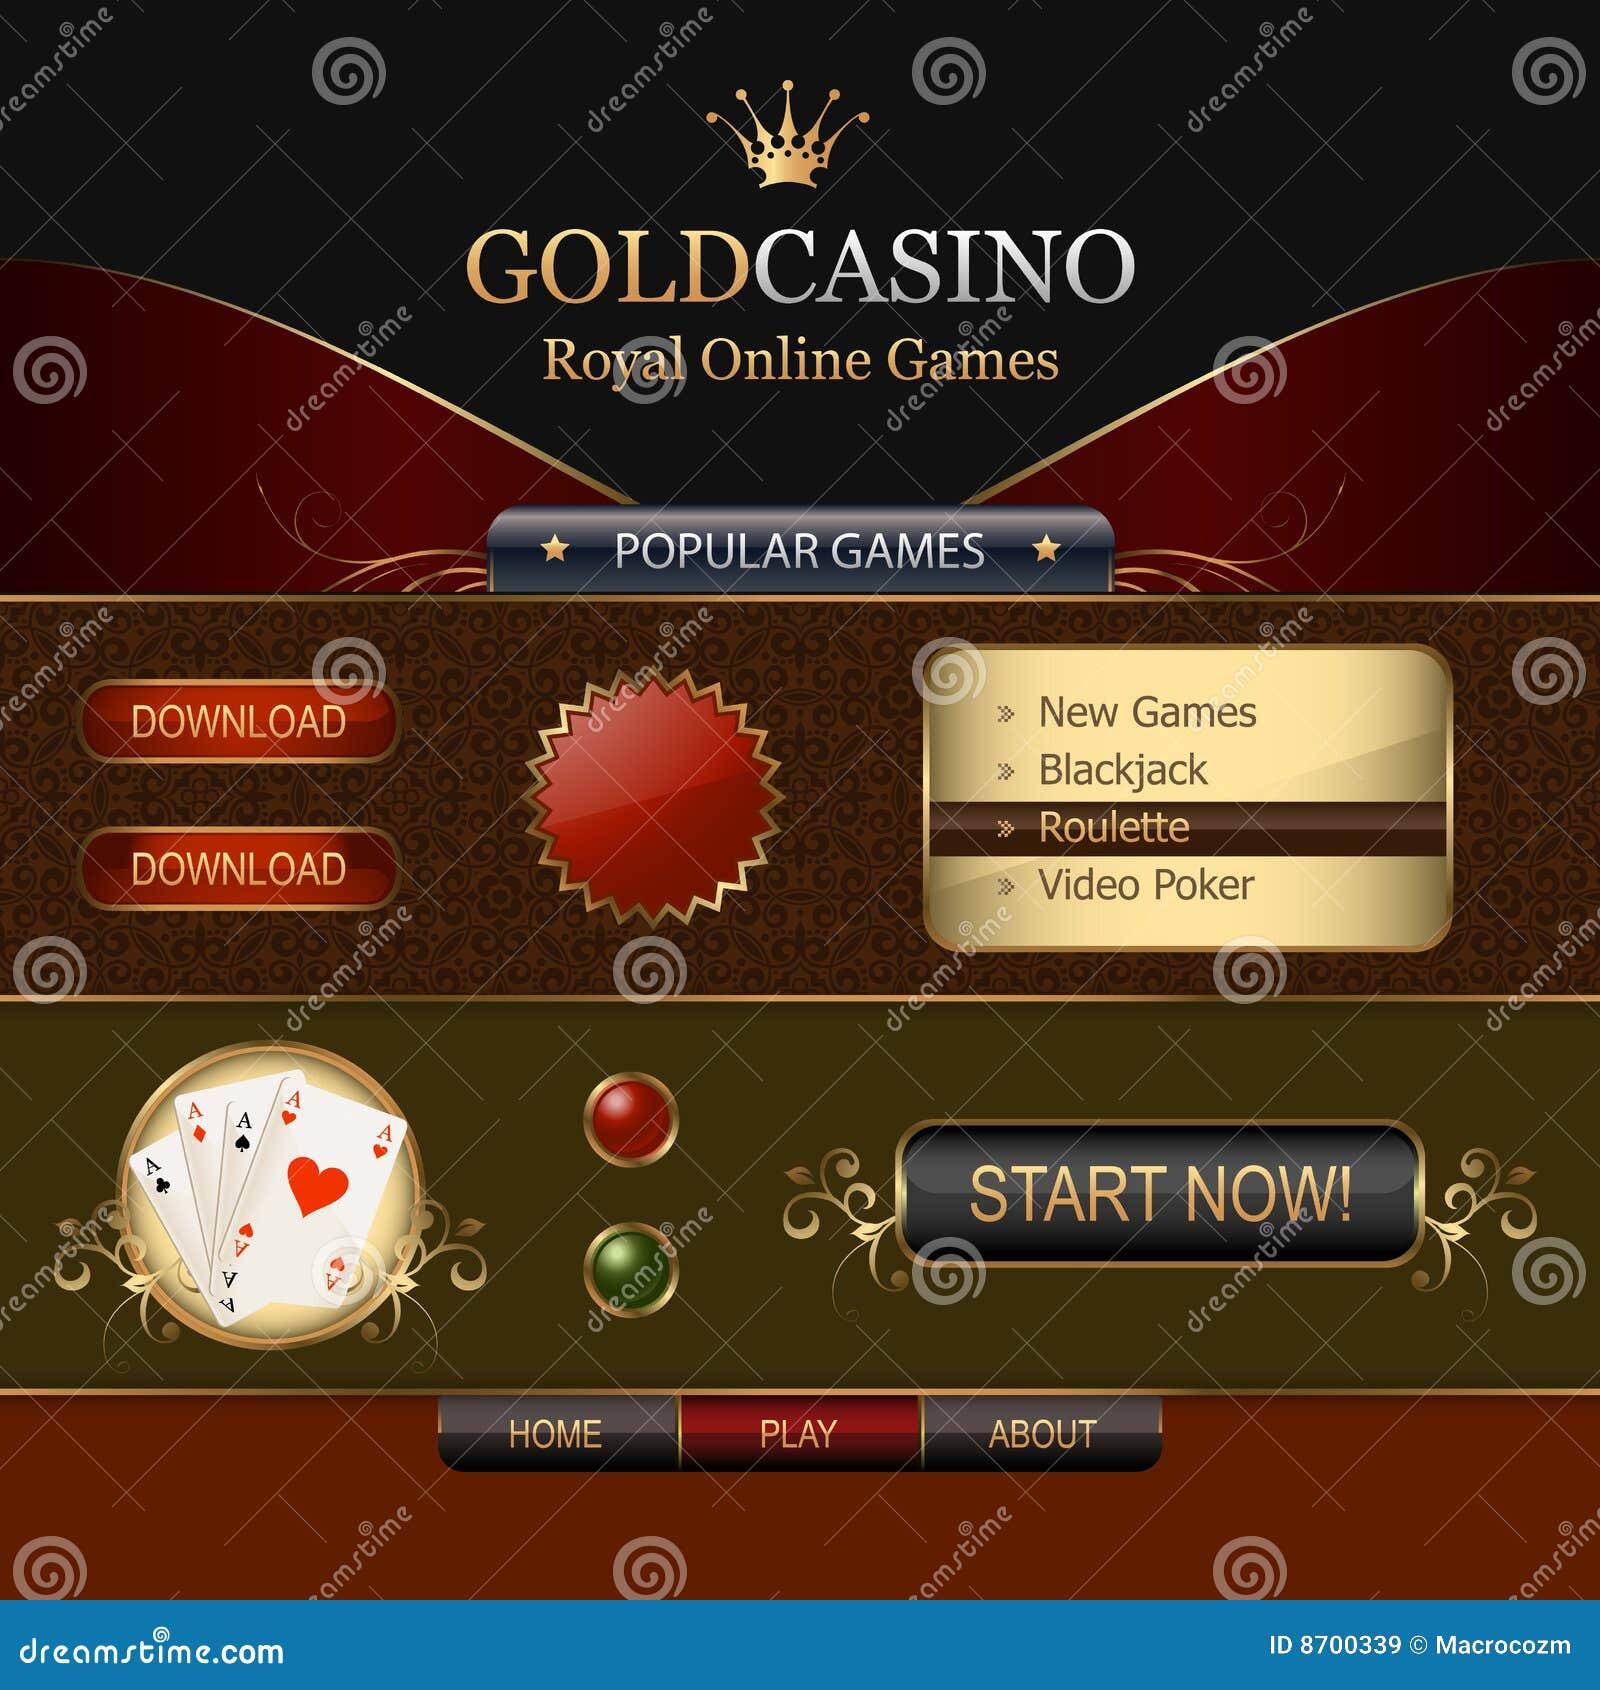 Best Indiana Casino, Money Online Play Poker, Online Poker With Friends